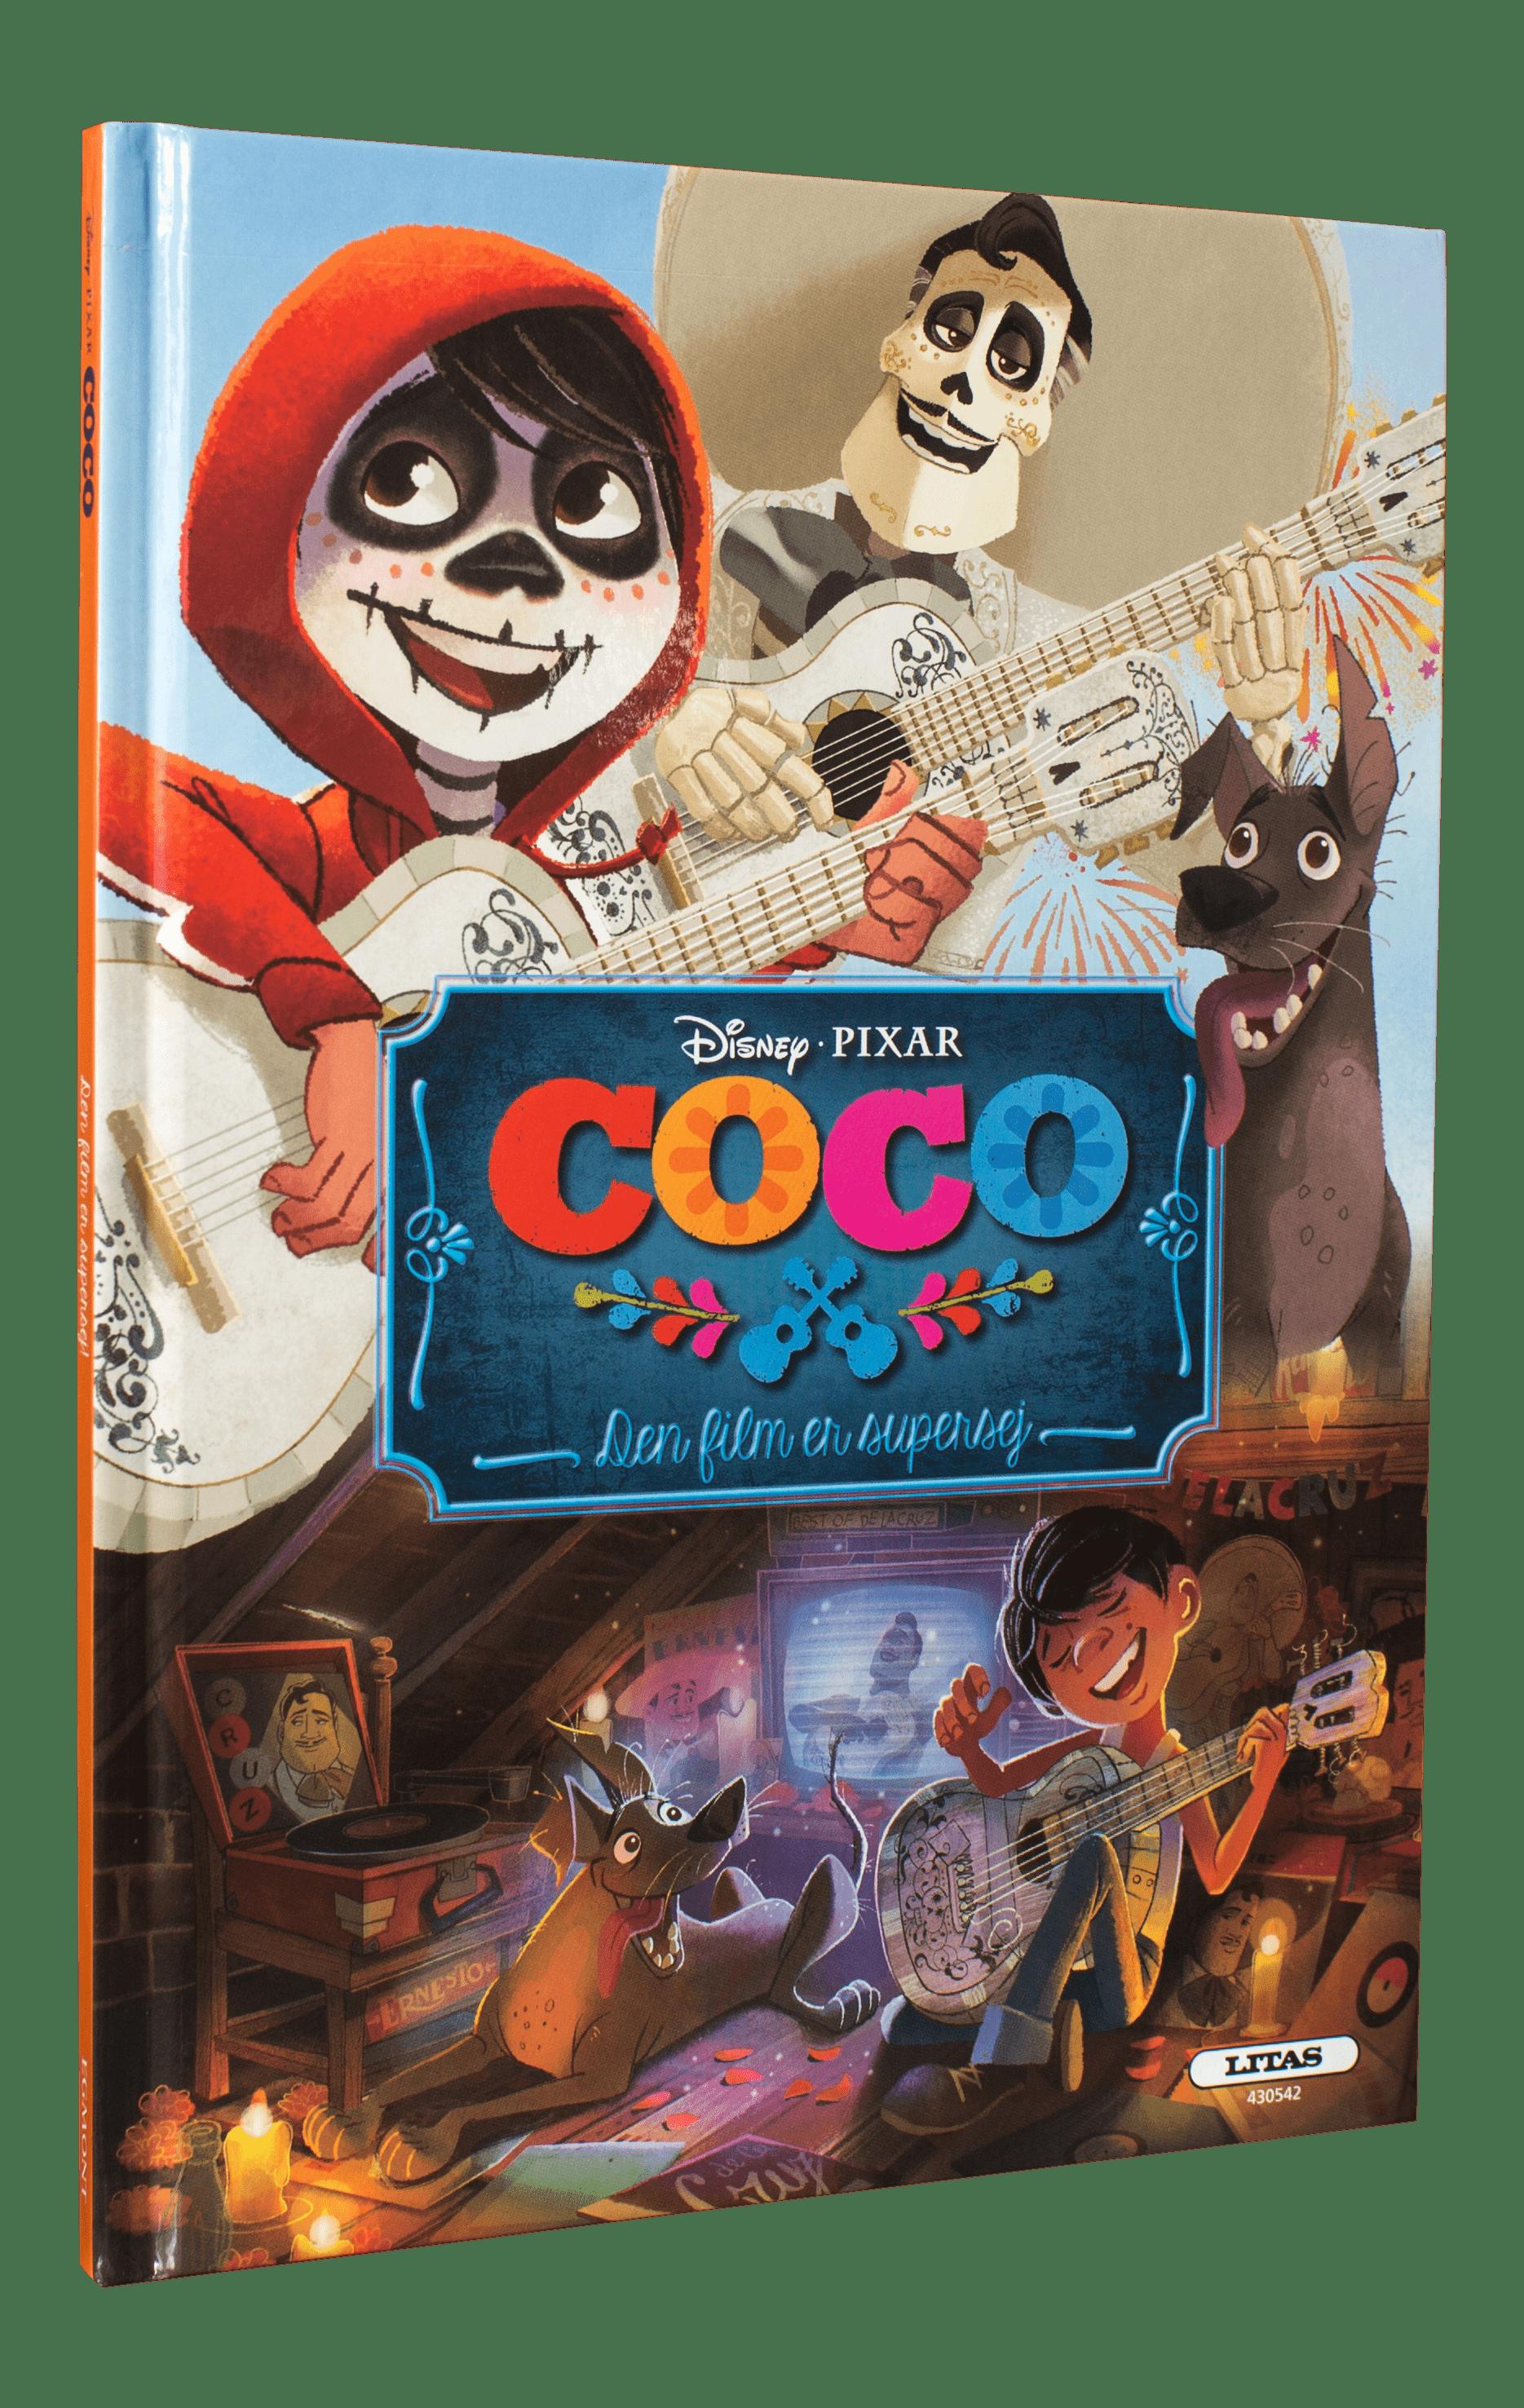 Coco, disney, pixar, disney coco, filmbog, malebøger